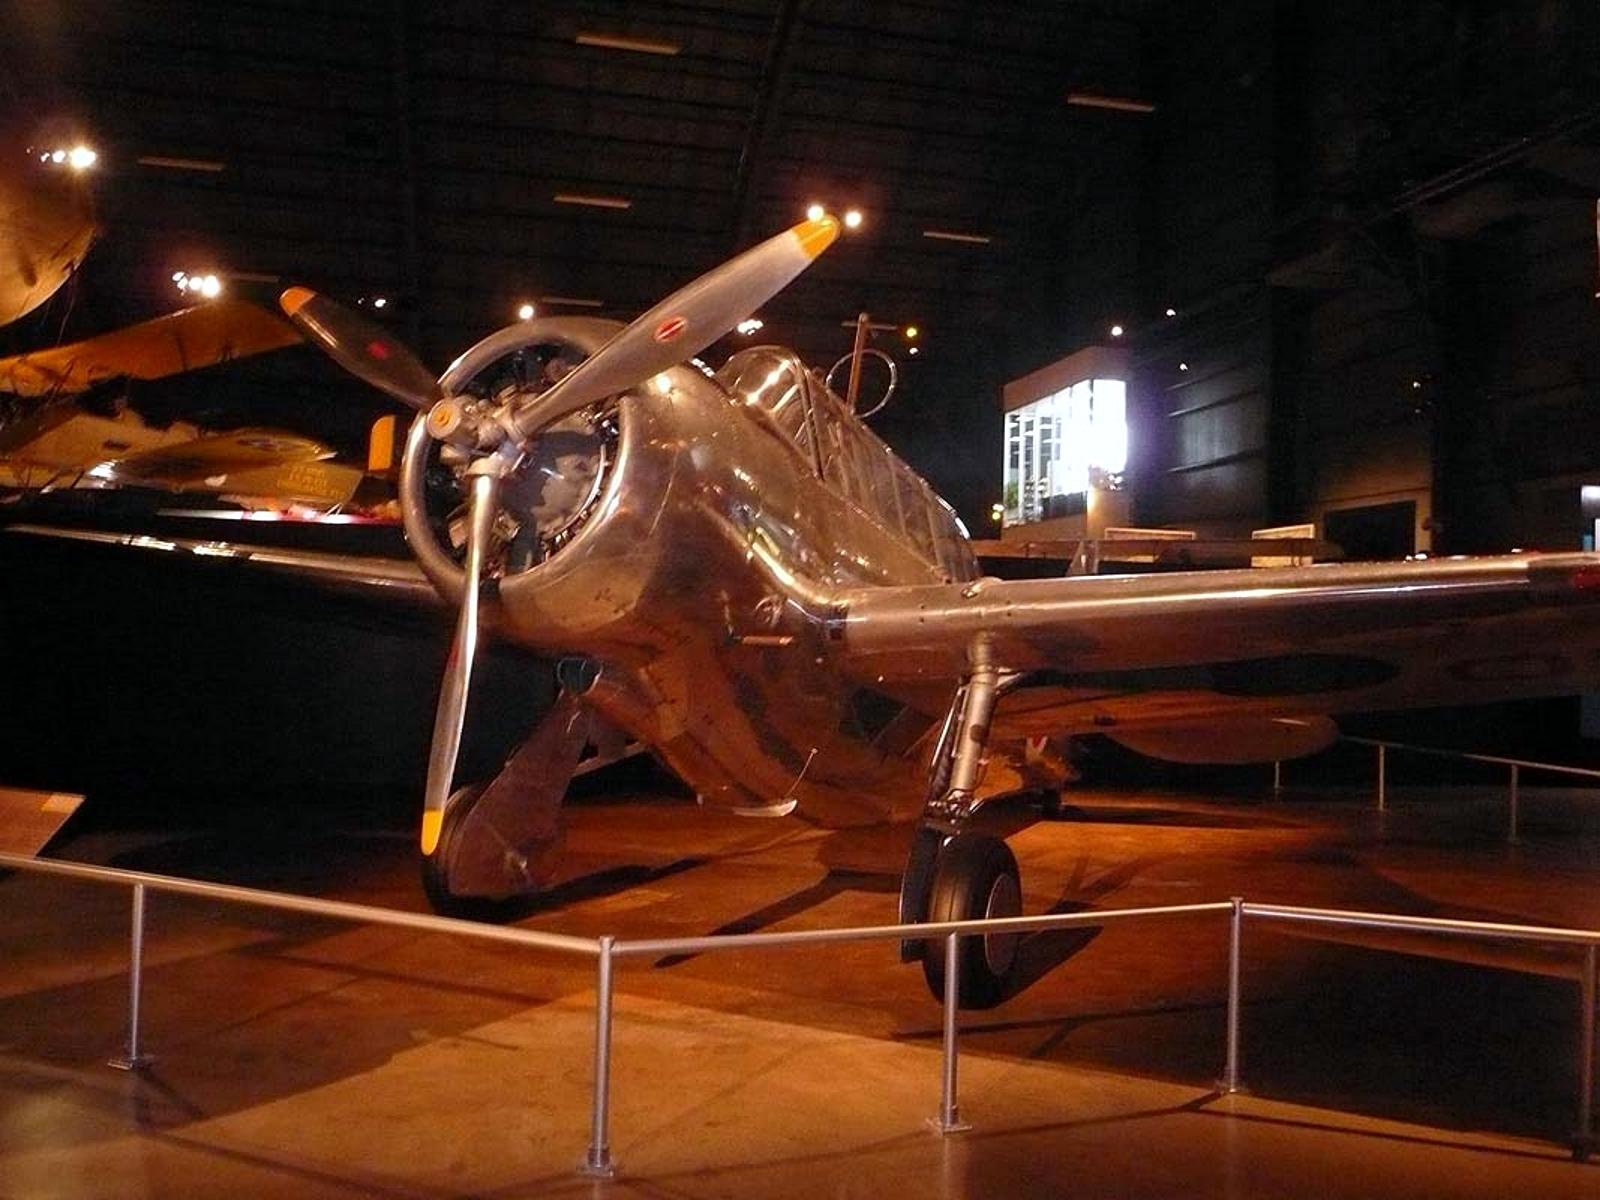 North American O-47B